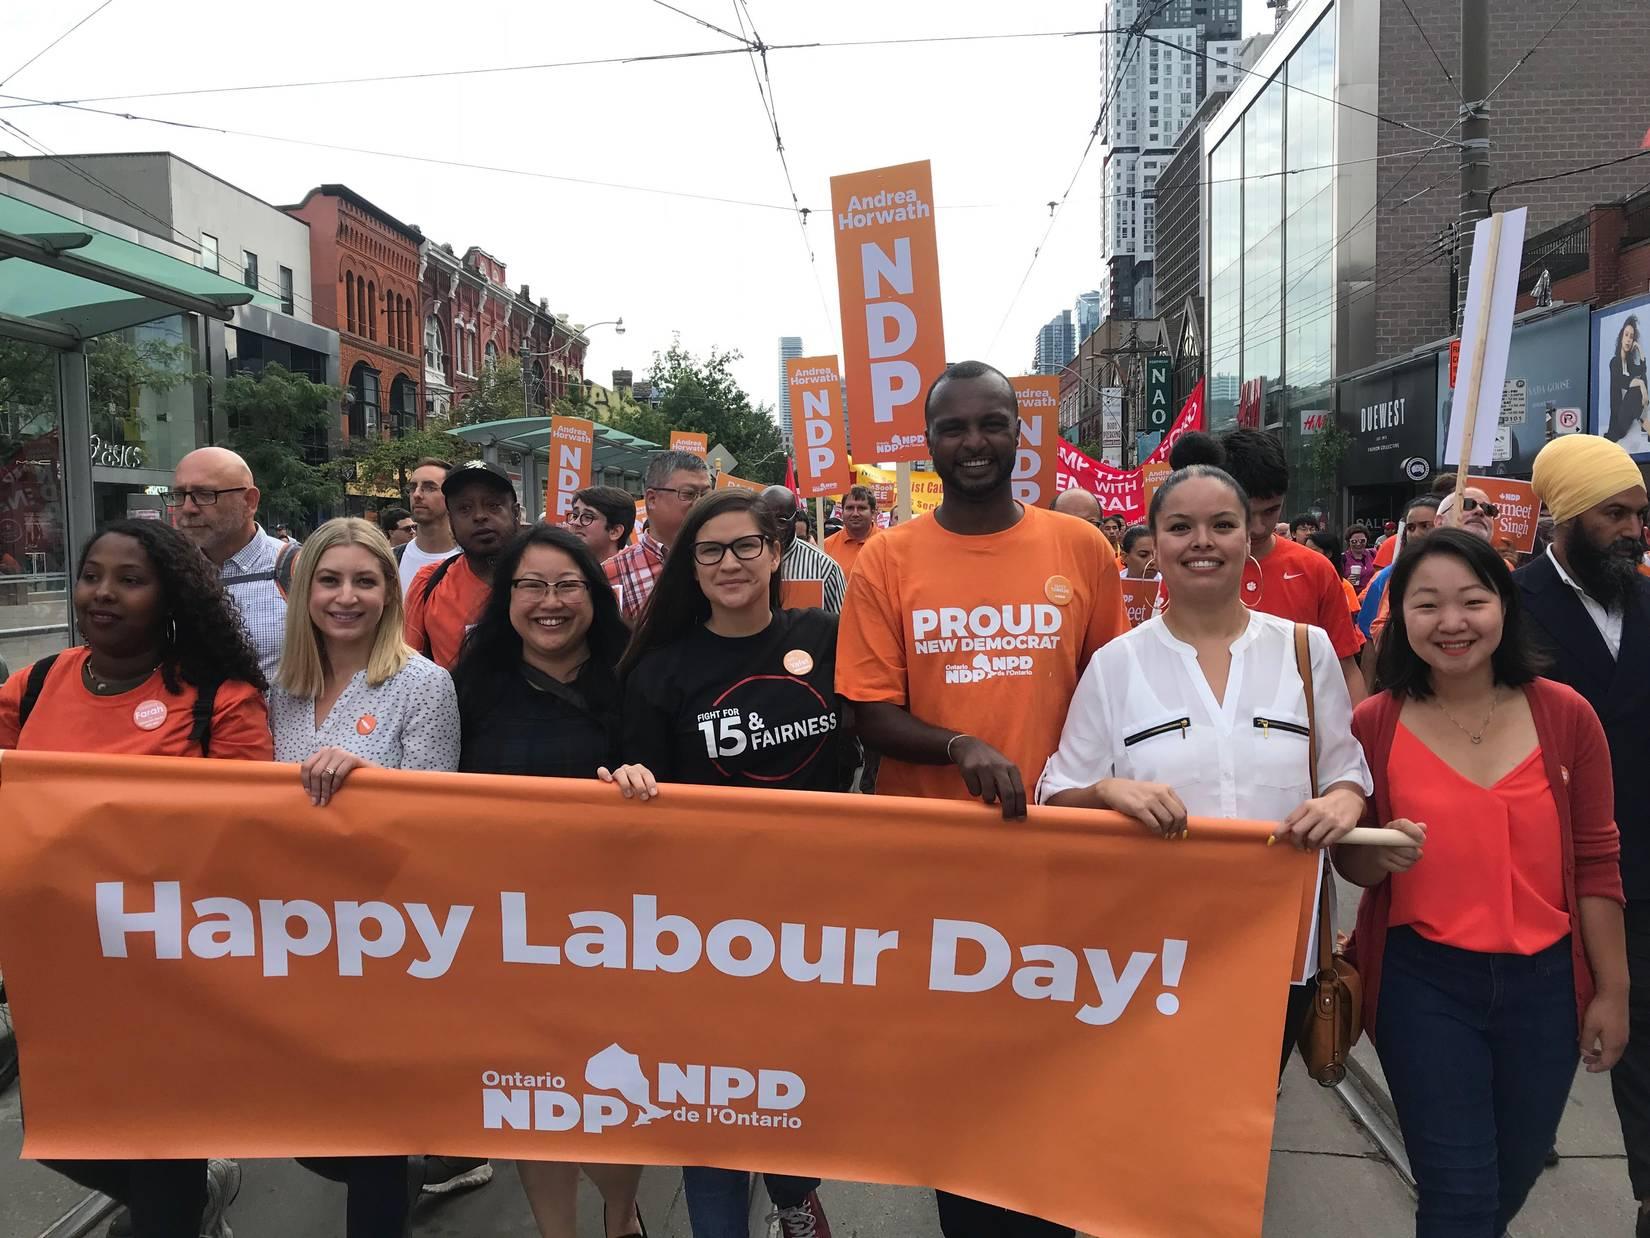 ndp_labour_day.jpg